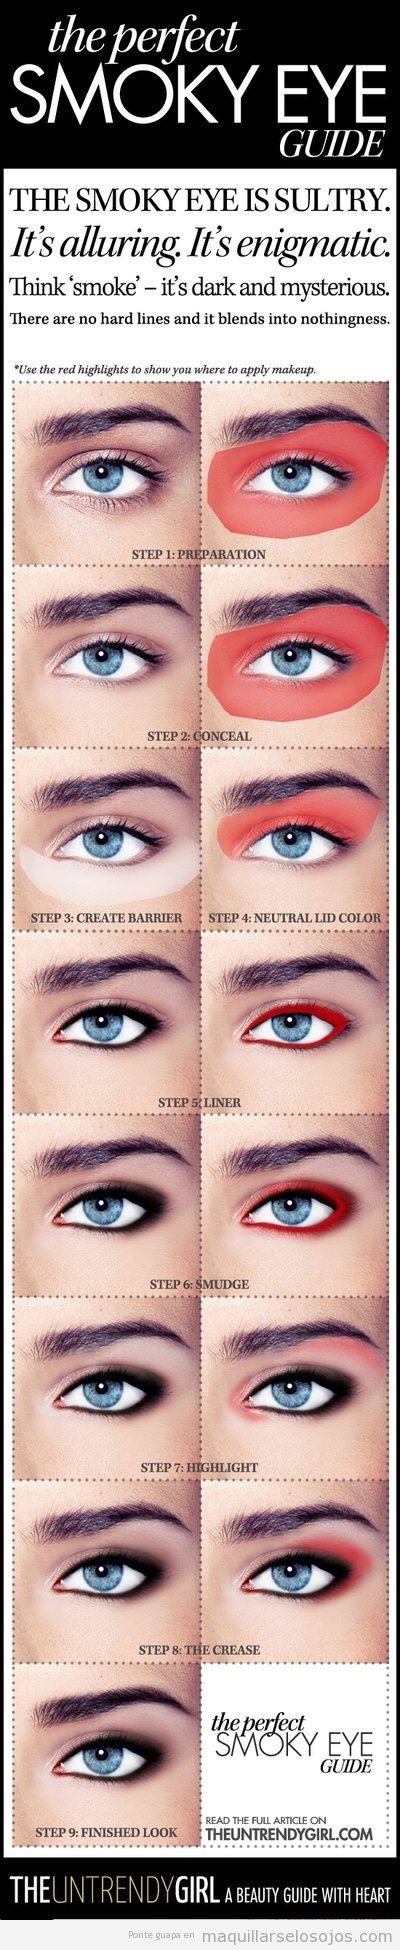 Tutorial paso a paso para aprender maquillar ojos ahumados